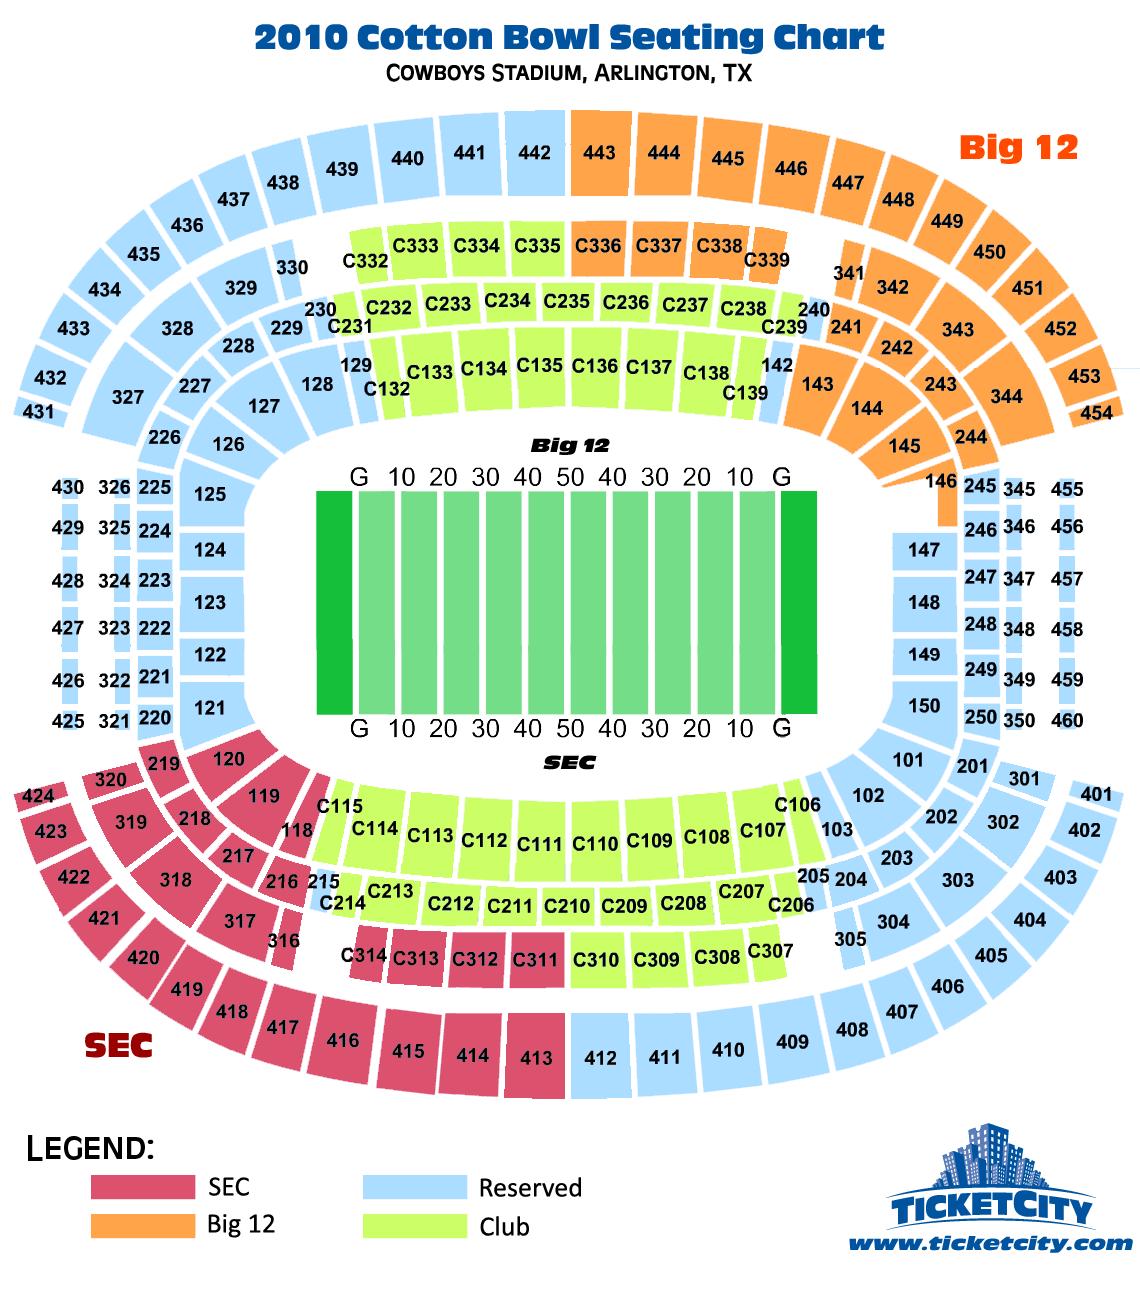 2010 Cotton Bowl Cowboys Stadium Seating Chart